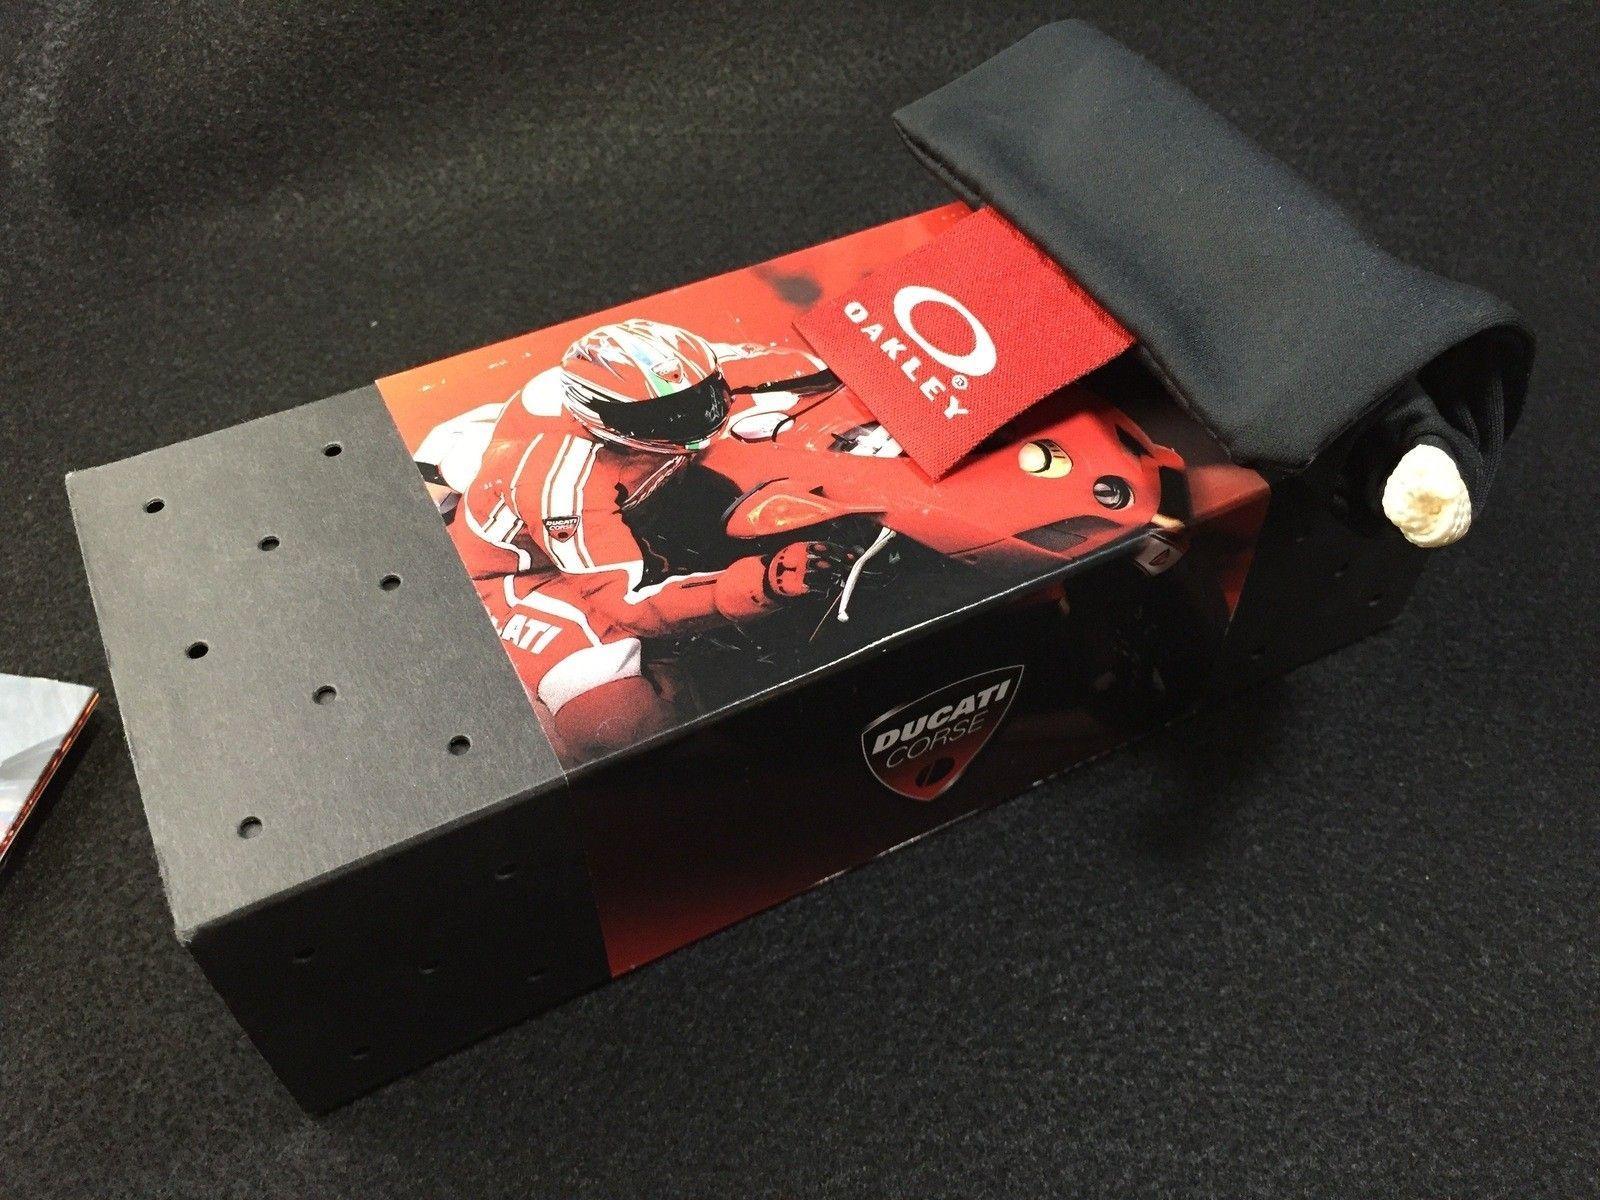 Ducati Juliet Carbon w/ SKU w/ box, coin, papers etc.... - IMG_2832.jpg